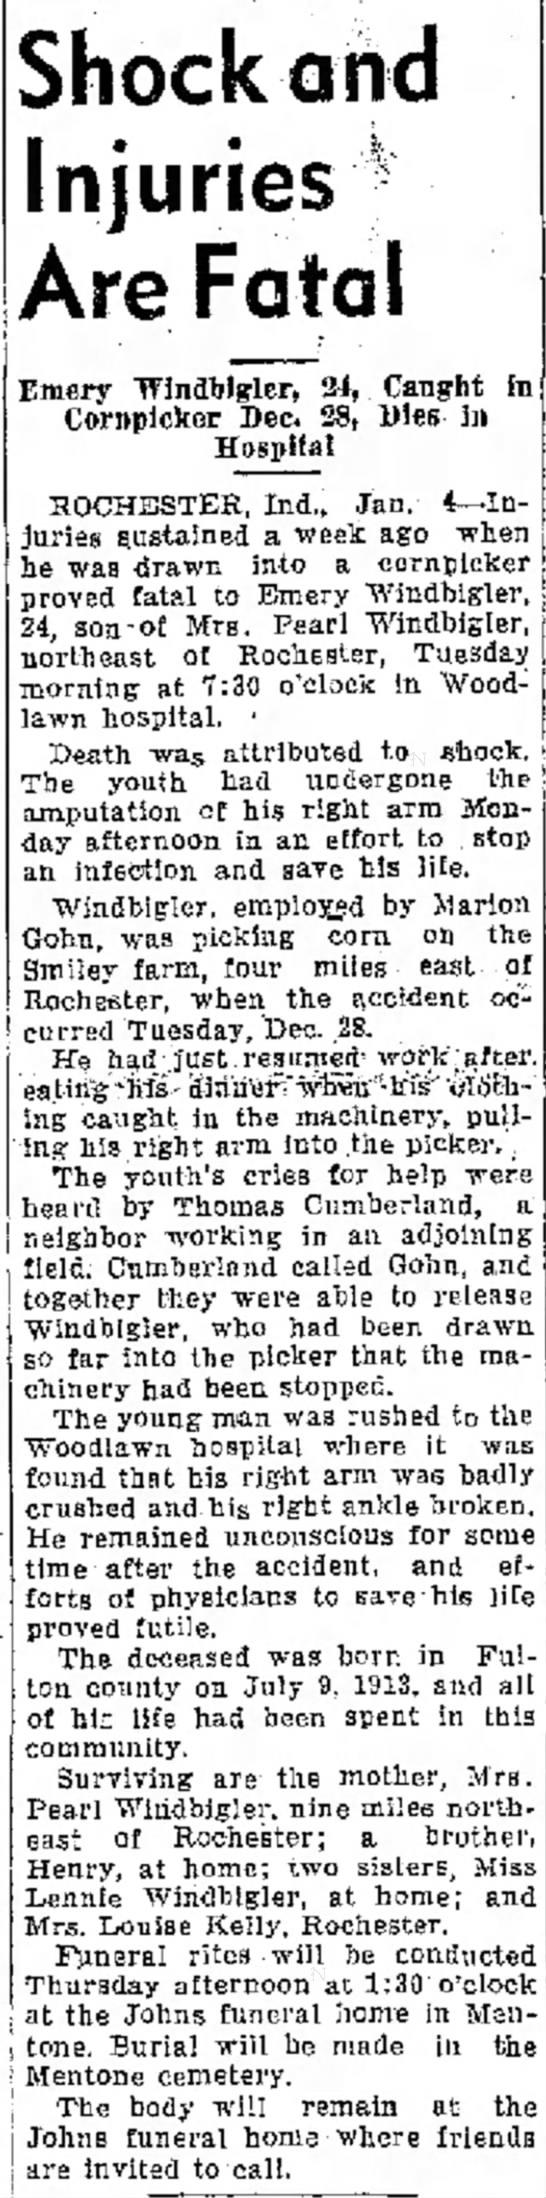 Emery Windbigler accident -